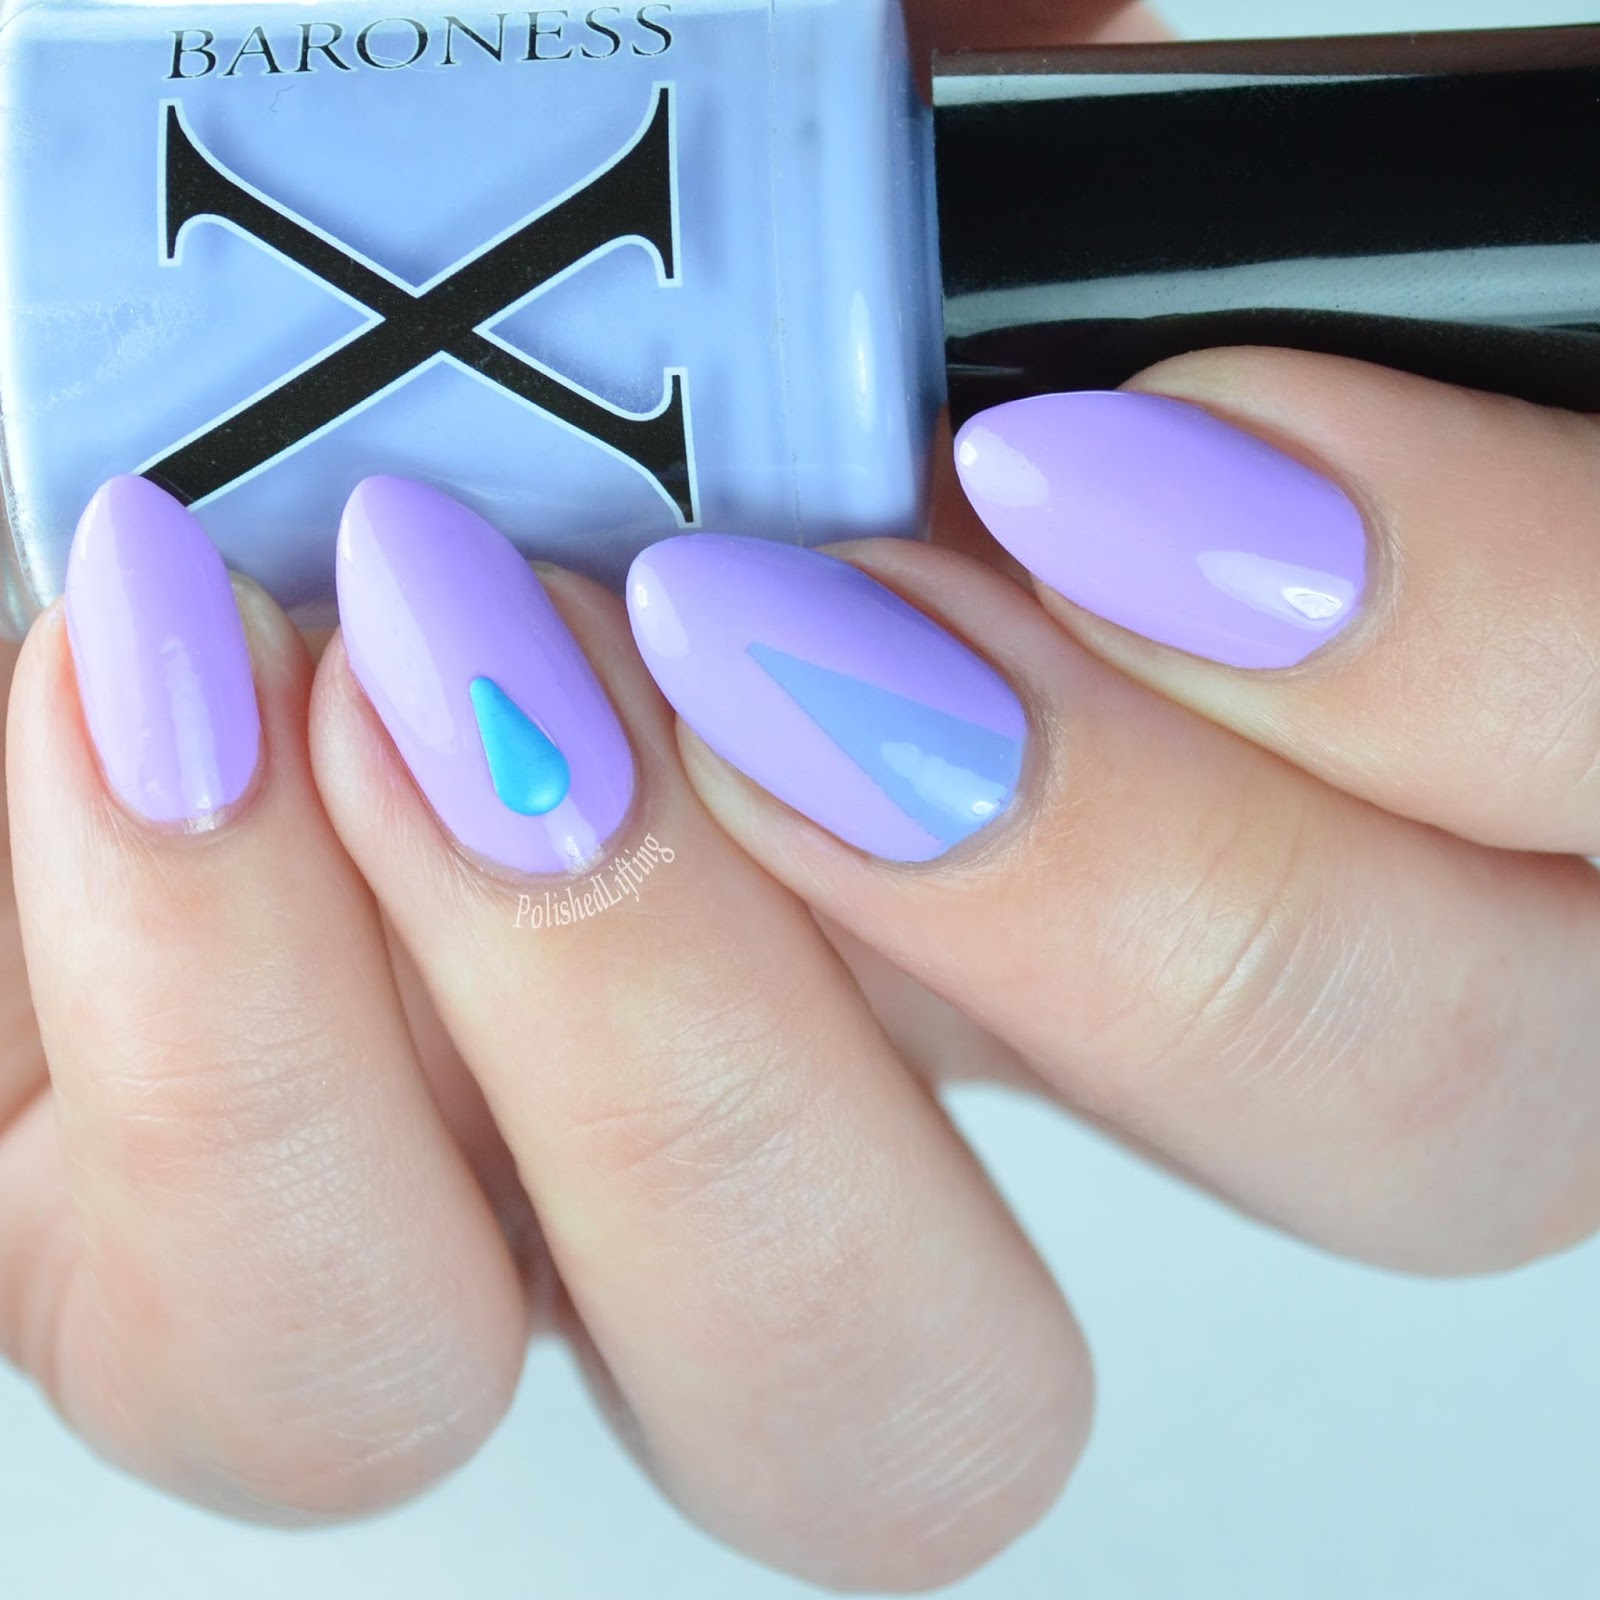 Polished Lifting: Baroness X Pastel Geometric Nail Art & Vinyl ...